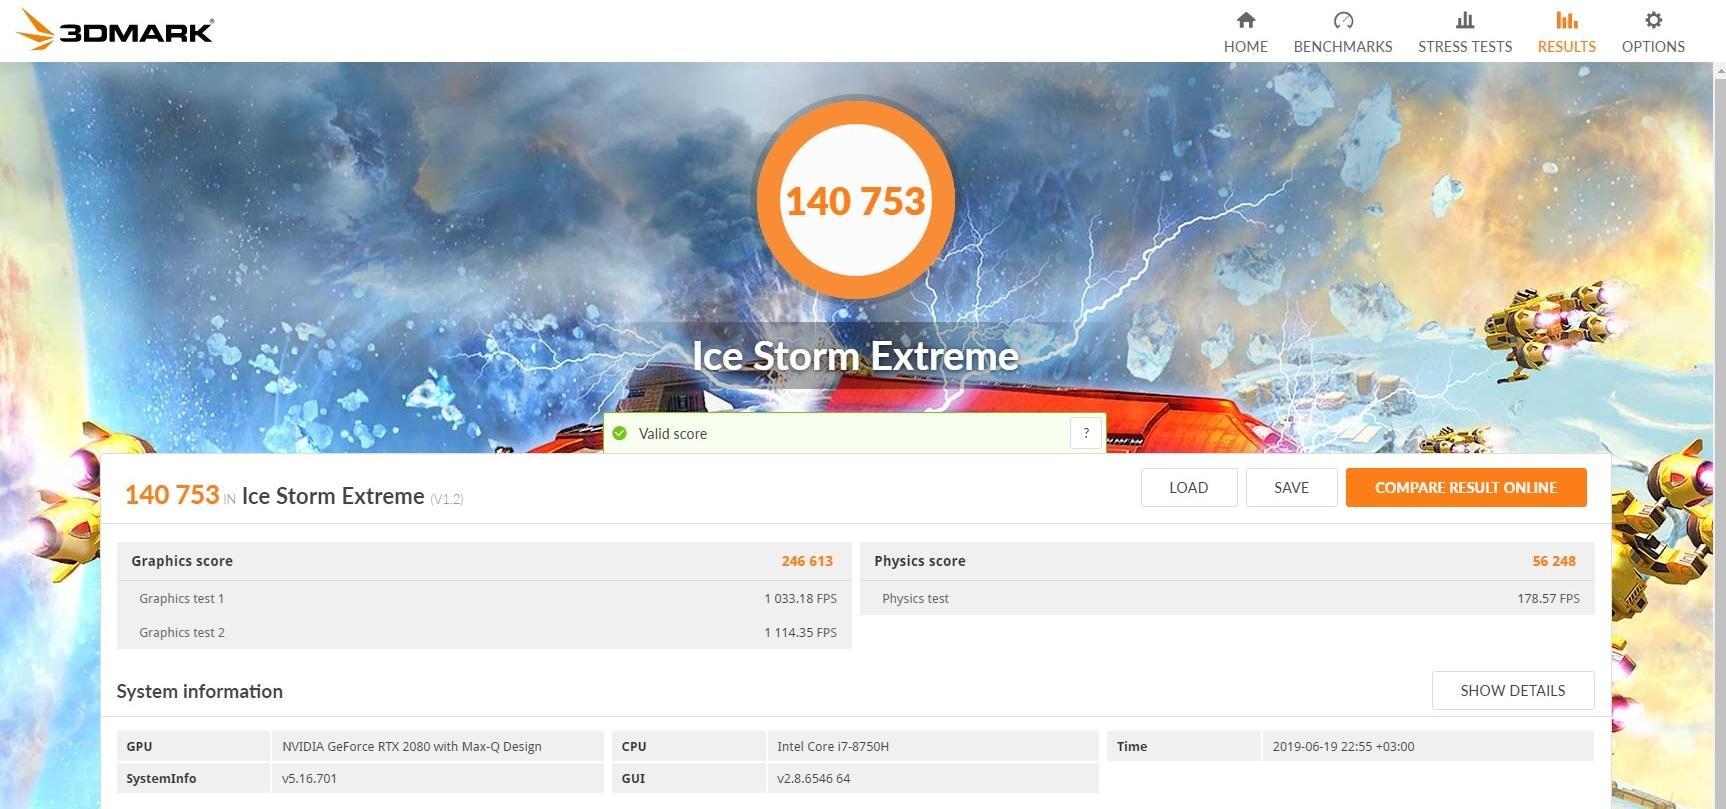 Acer Predator Triton 500-3dmark ice storm extrem